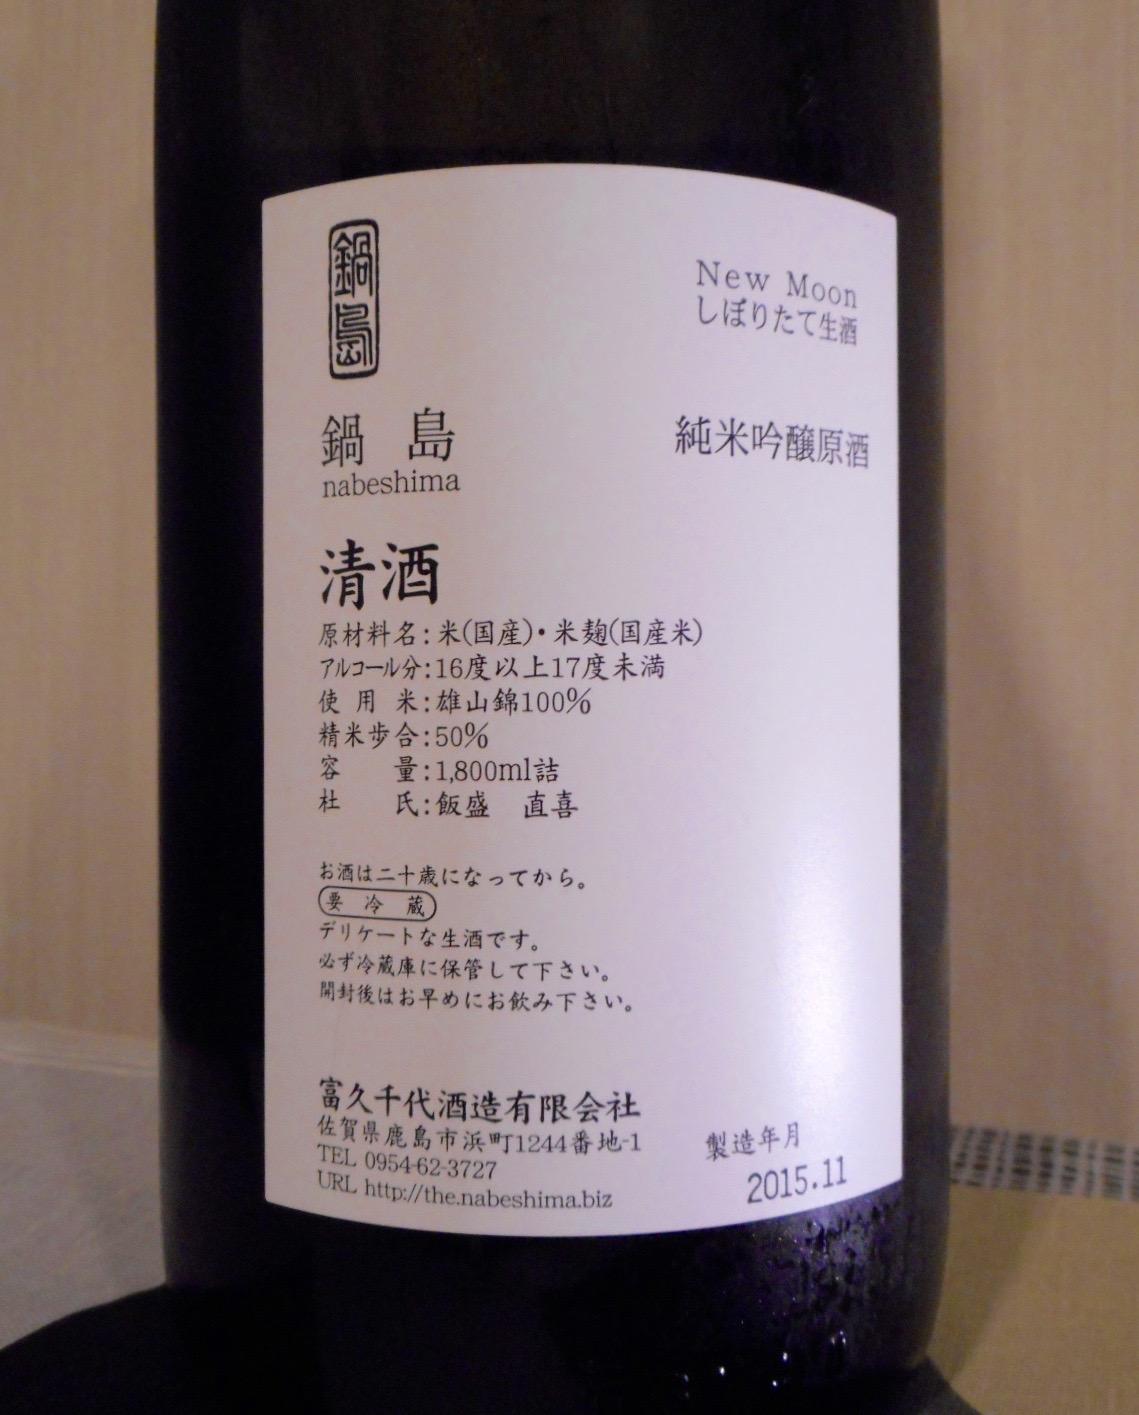 nabeshima_newmoon2.jpg